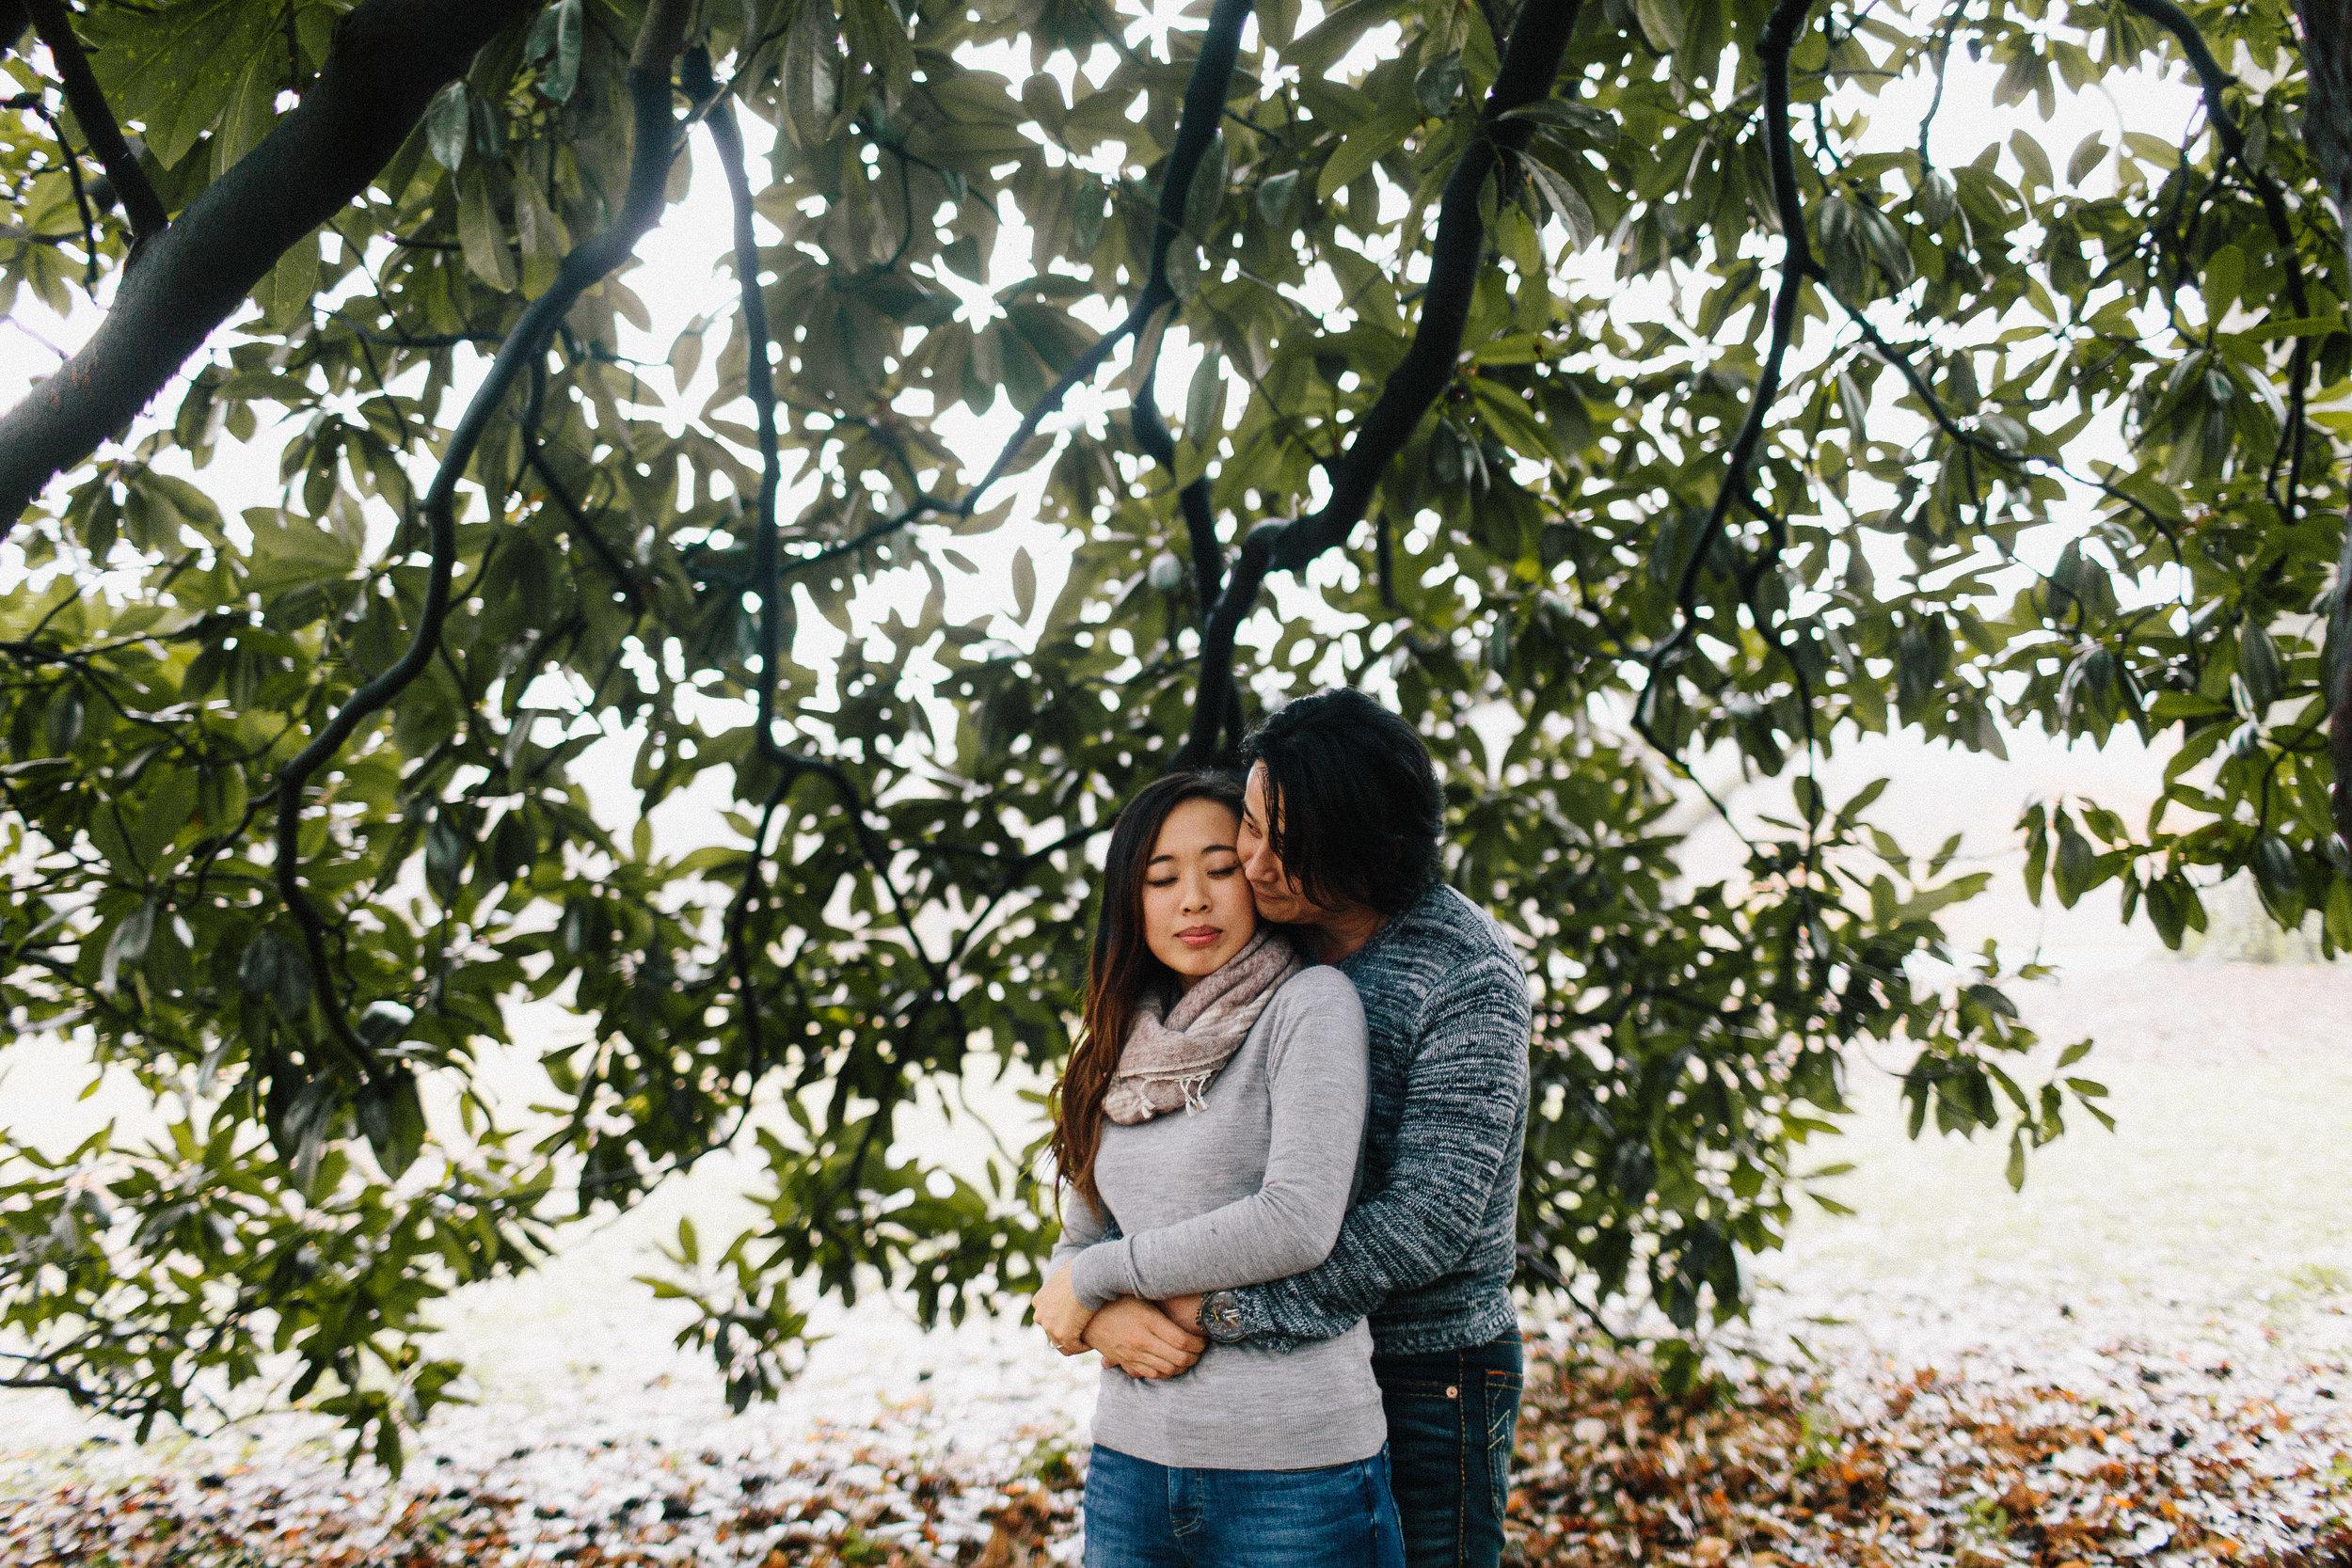 atlanta_gloomy_day_rainy_engagement_couple_lifestyle_fun_playful_artistic_georgia_photographer_2124.jpg